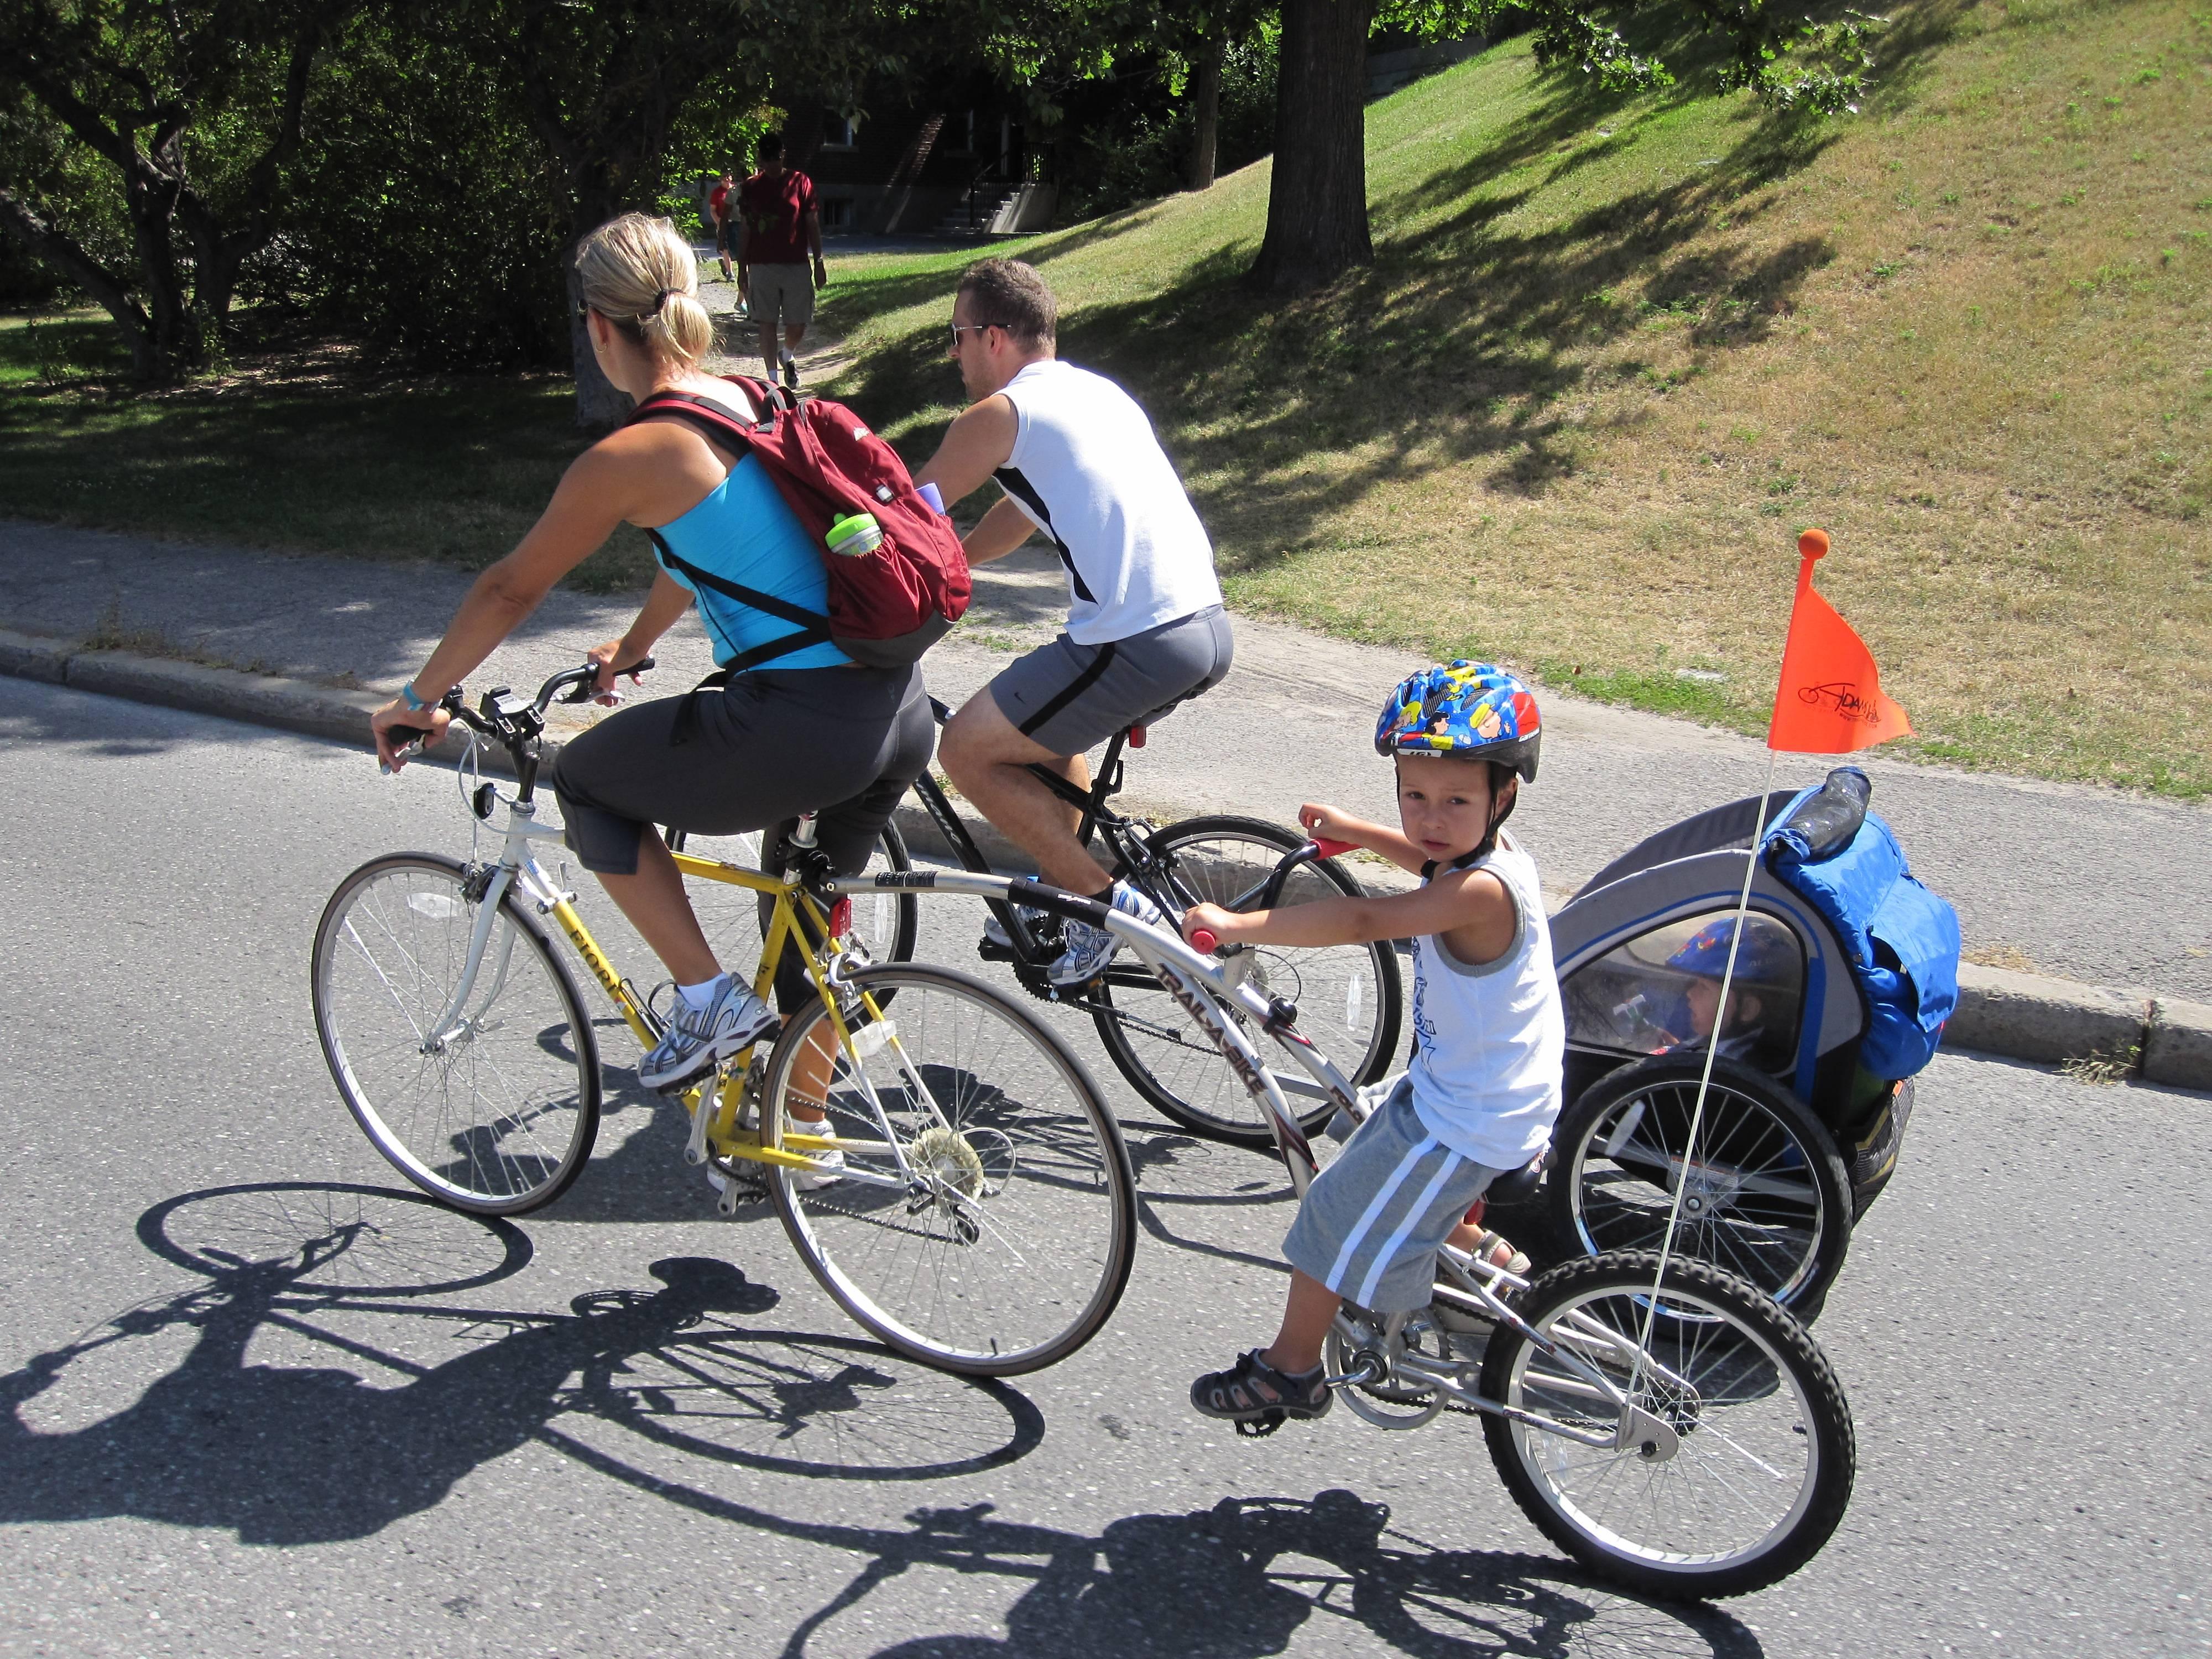 2011-07-24-ottawa-bicycle-culture-10